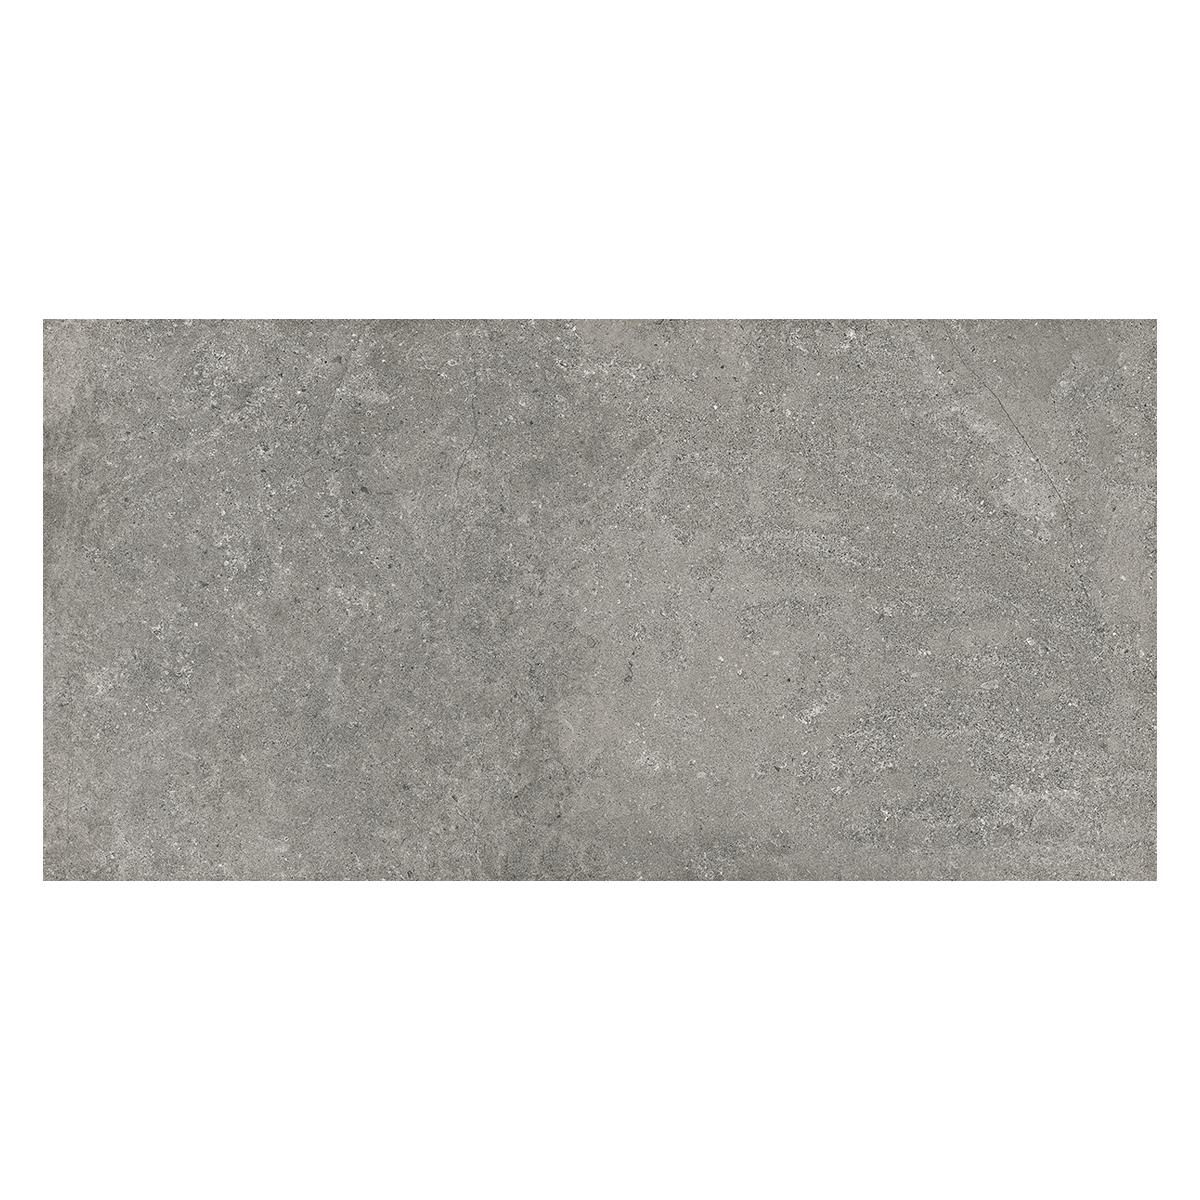 Porcelanato Belfast Marengo Mate - 60X120 cm - 1.44 m2